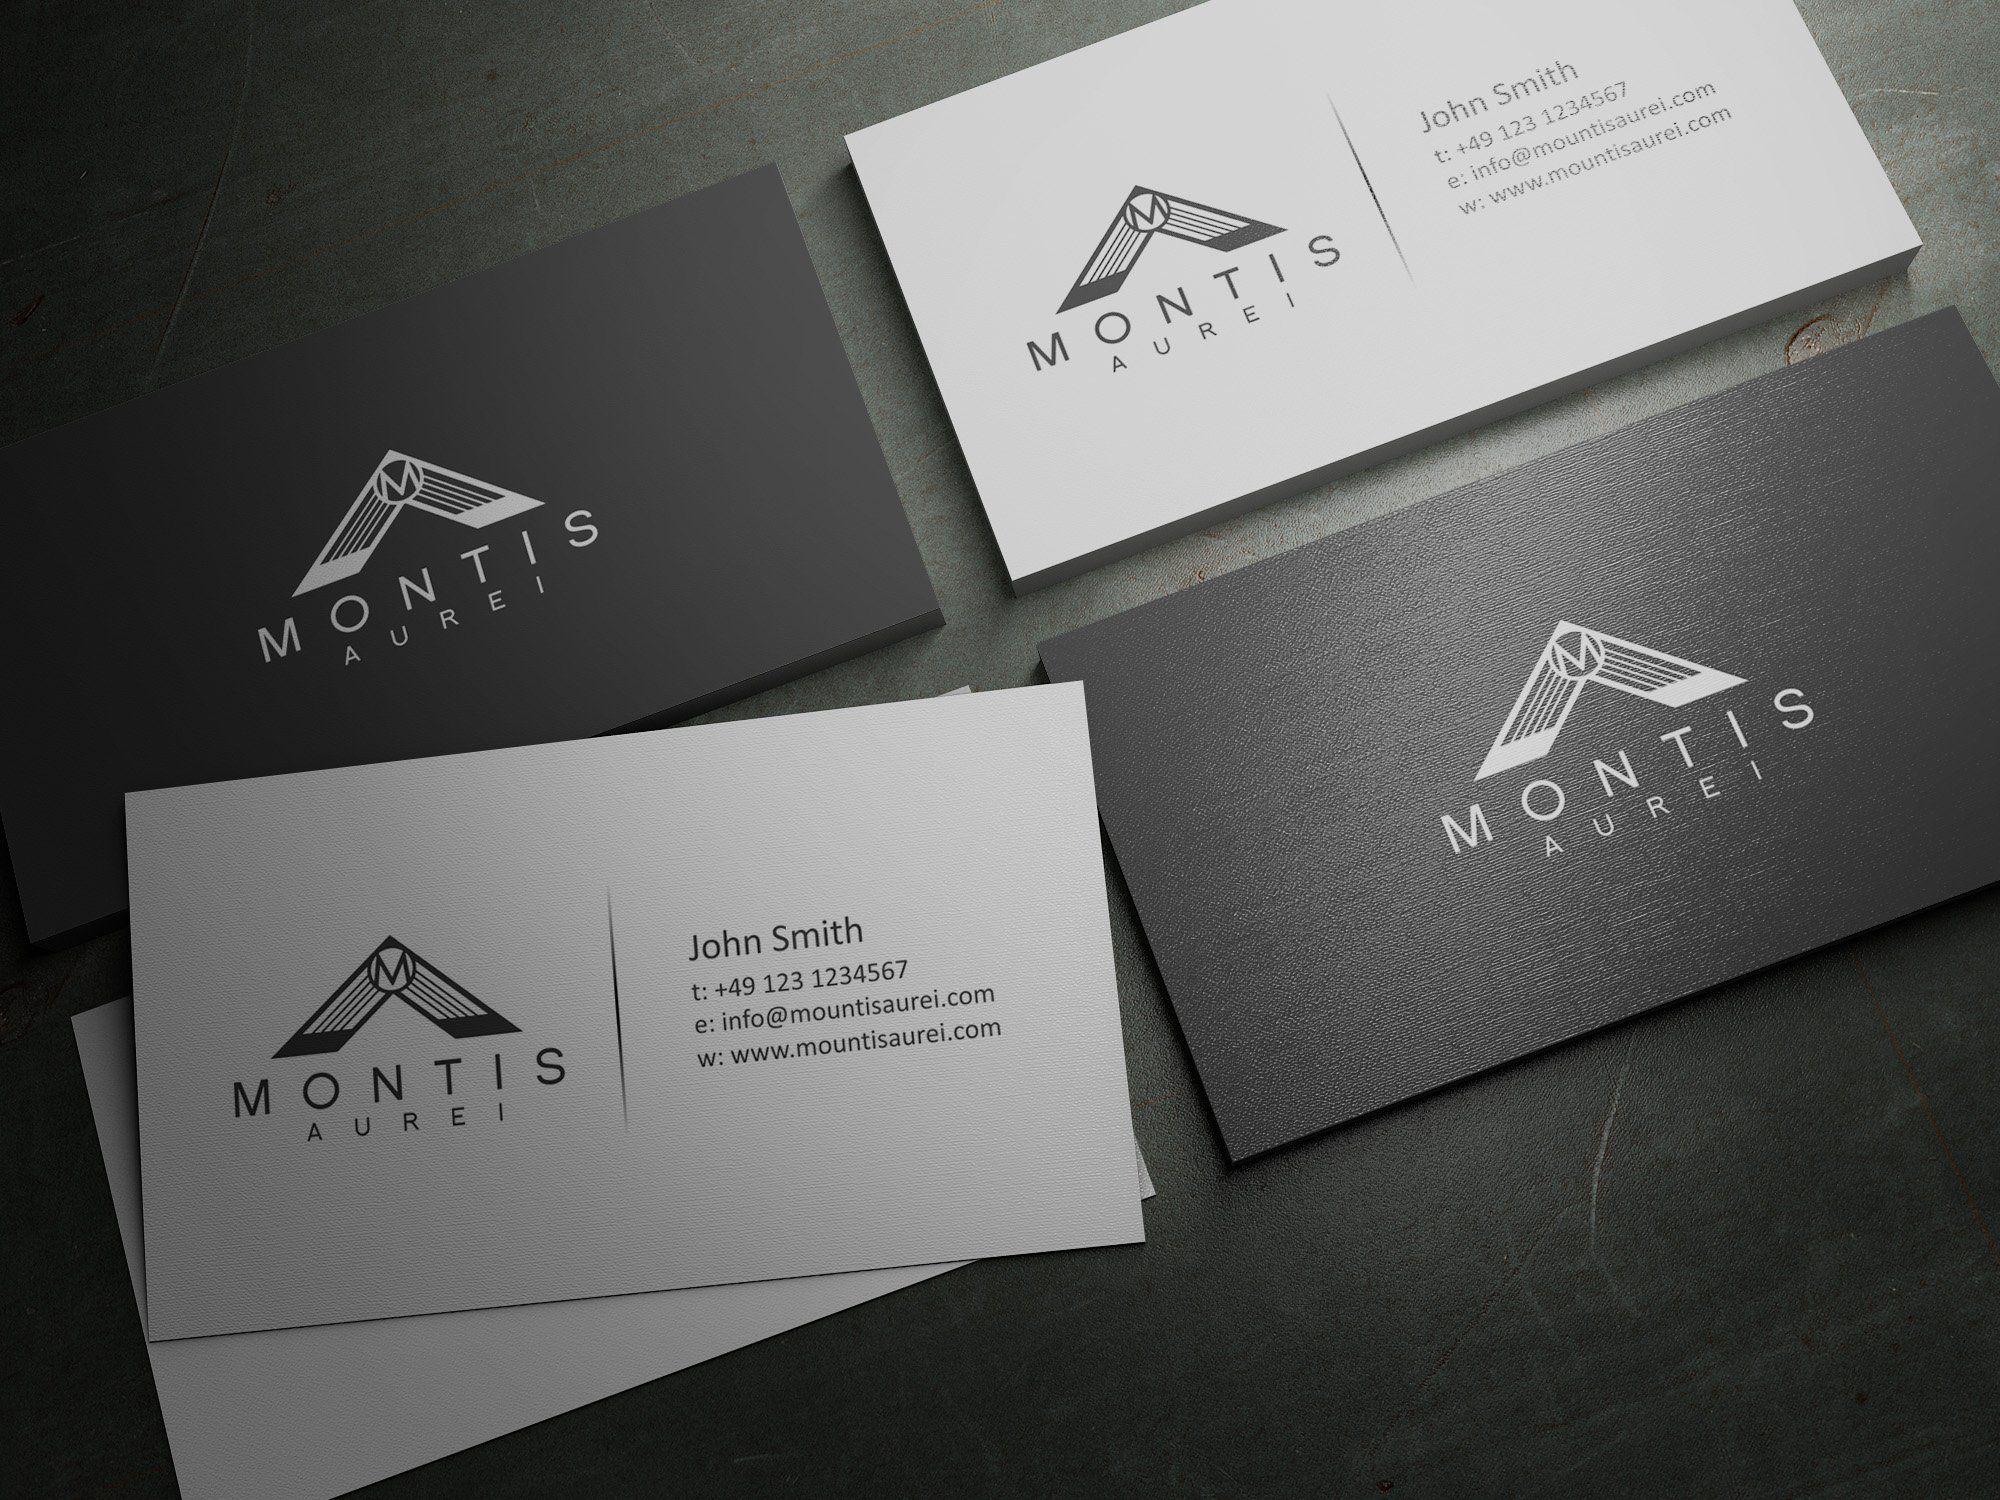 Business Card Design from Montis Aurei contest | BIZ CARD DESIGN ...